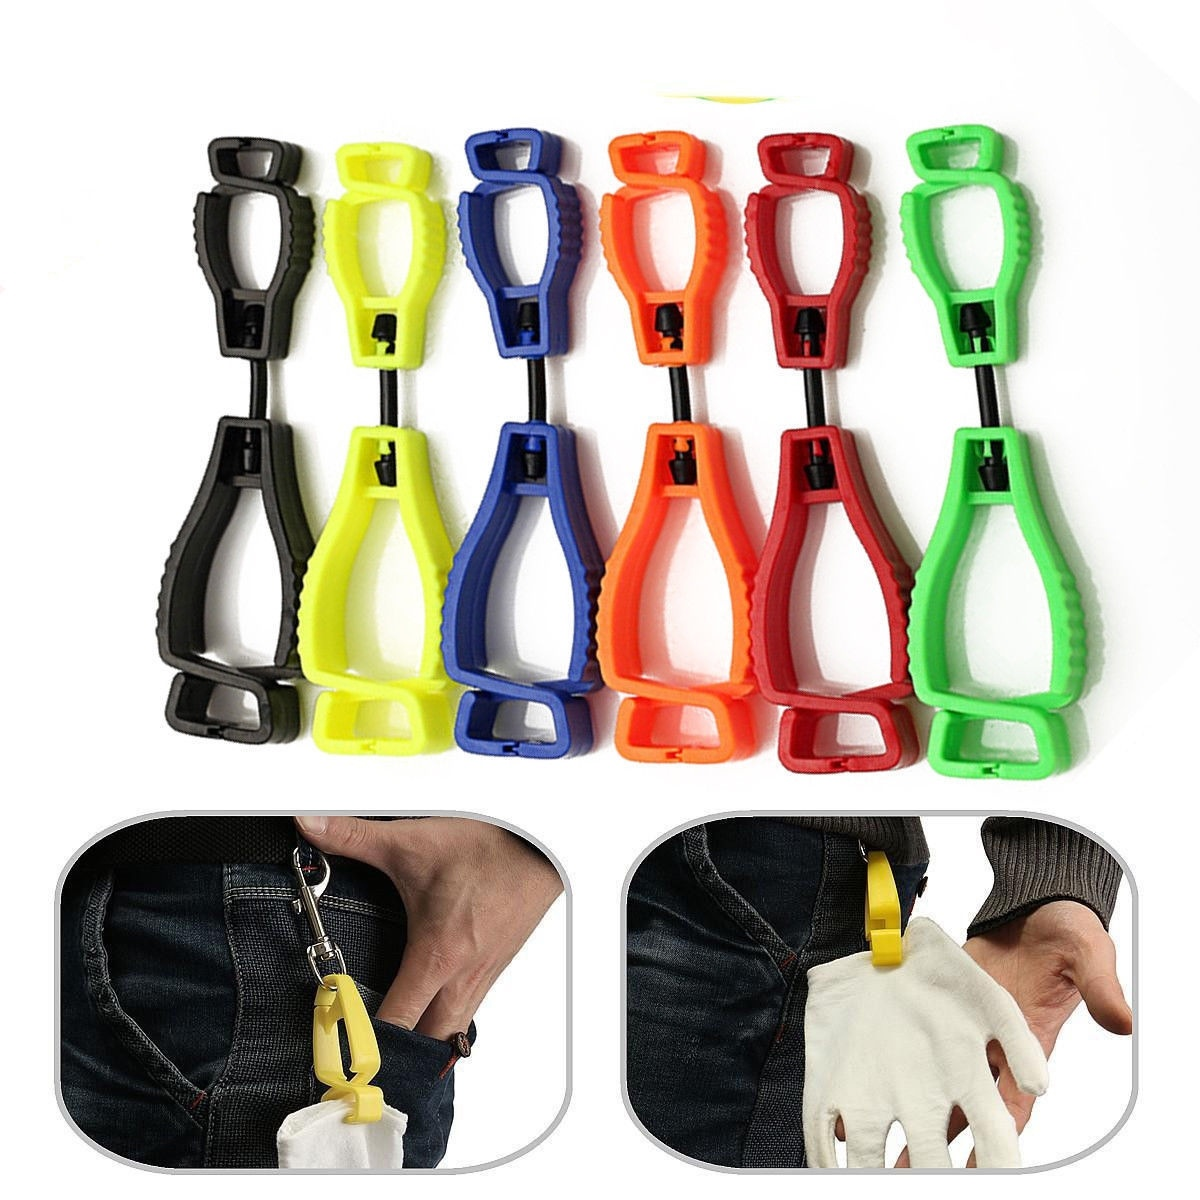 Safety Guard Glove Clip Holder Hanger Labor Work Clamp Grabber Catcher Work Hot